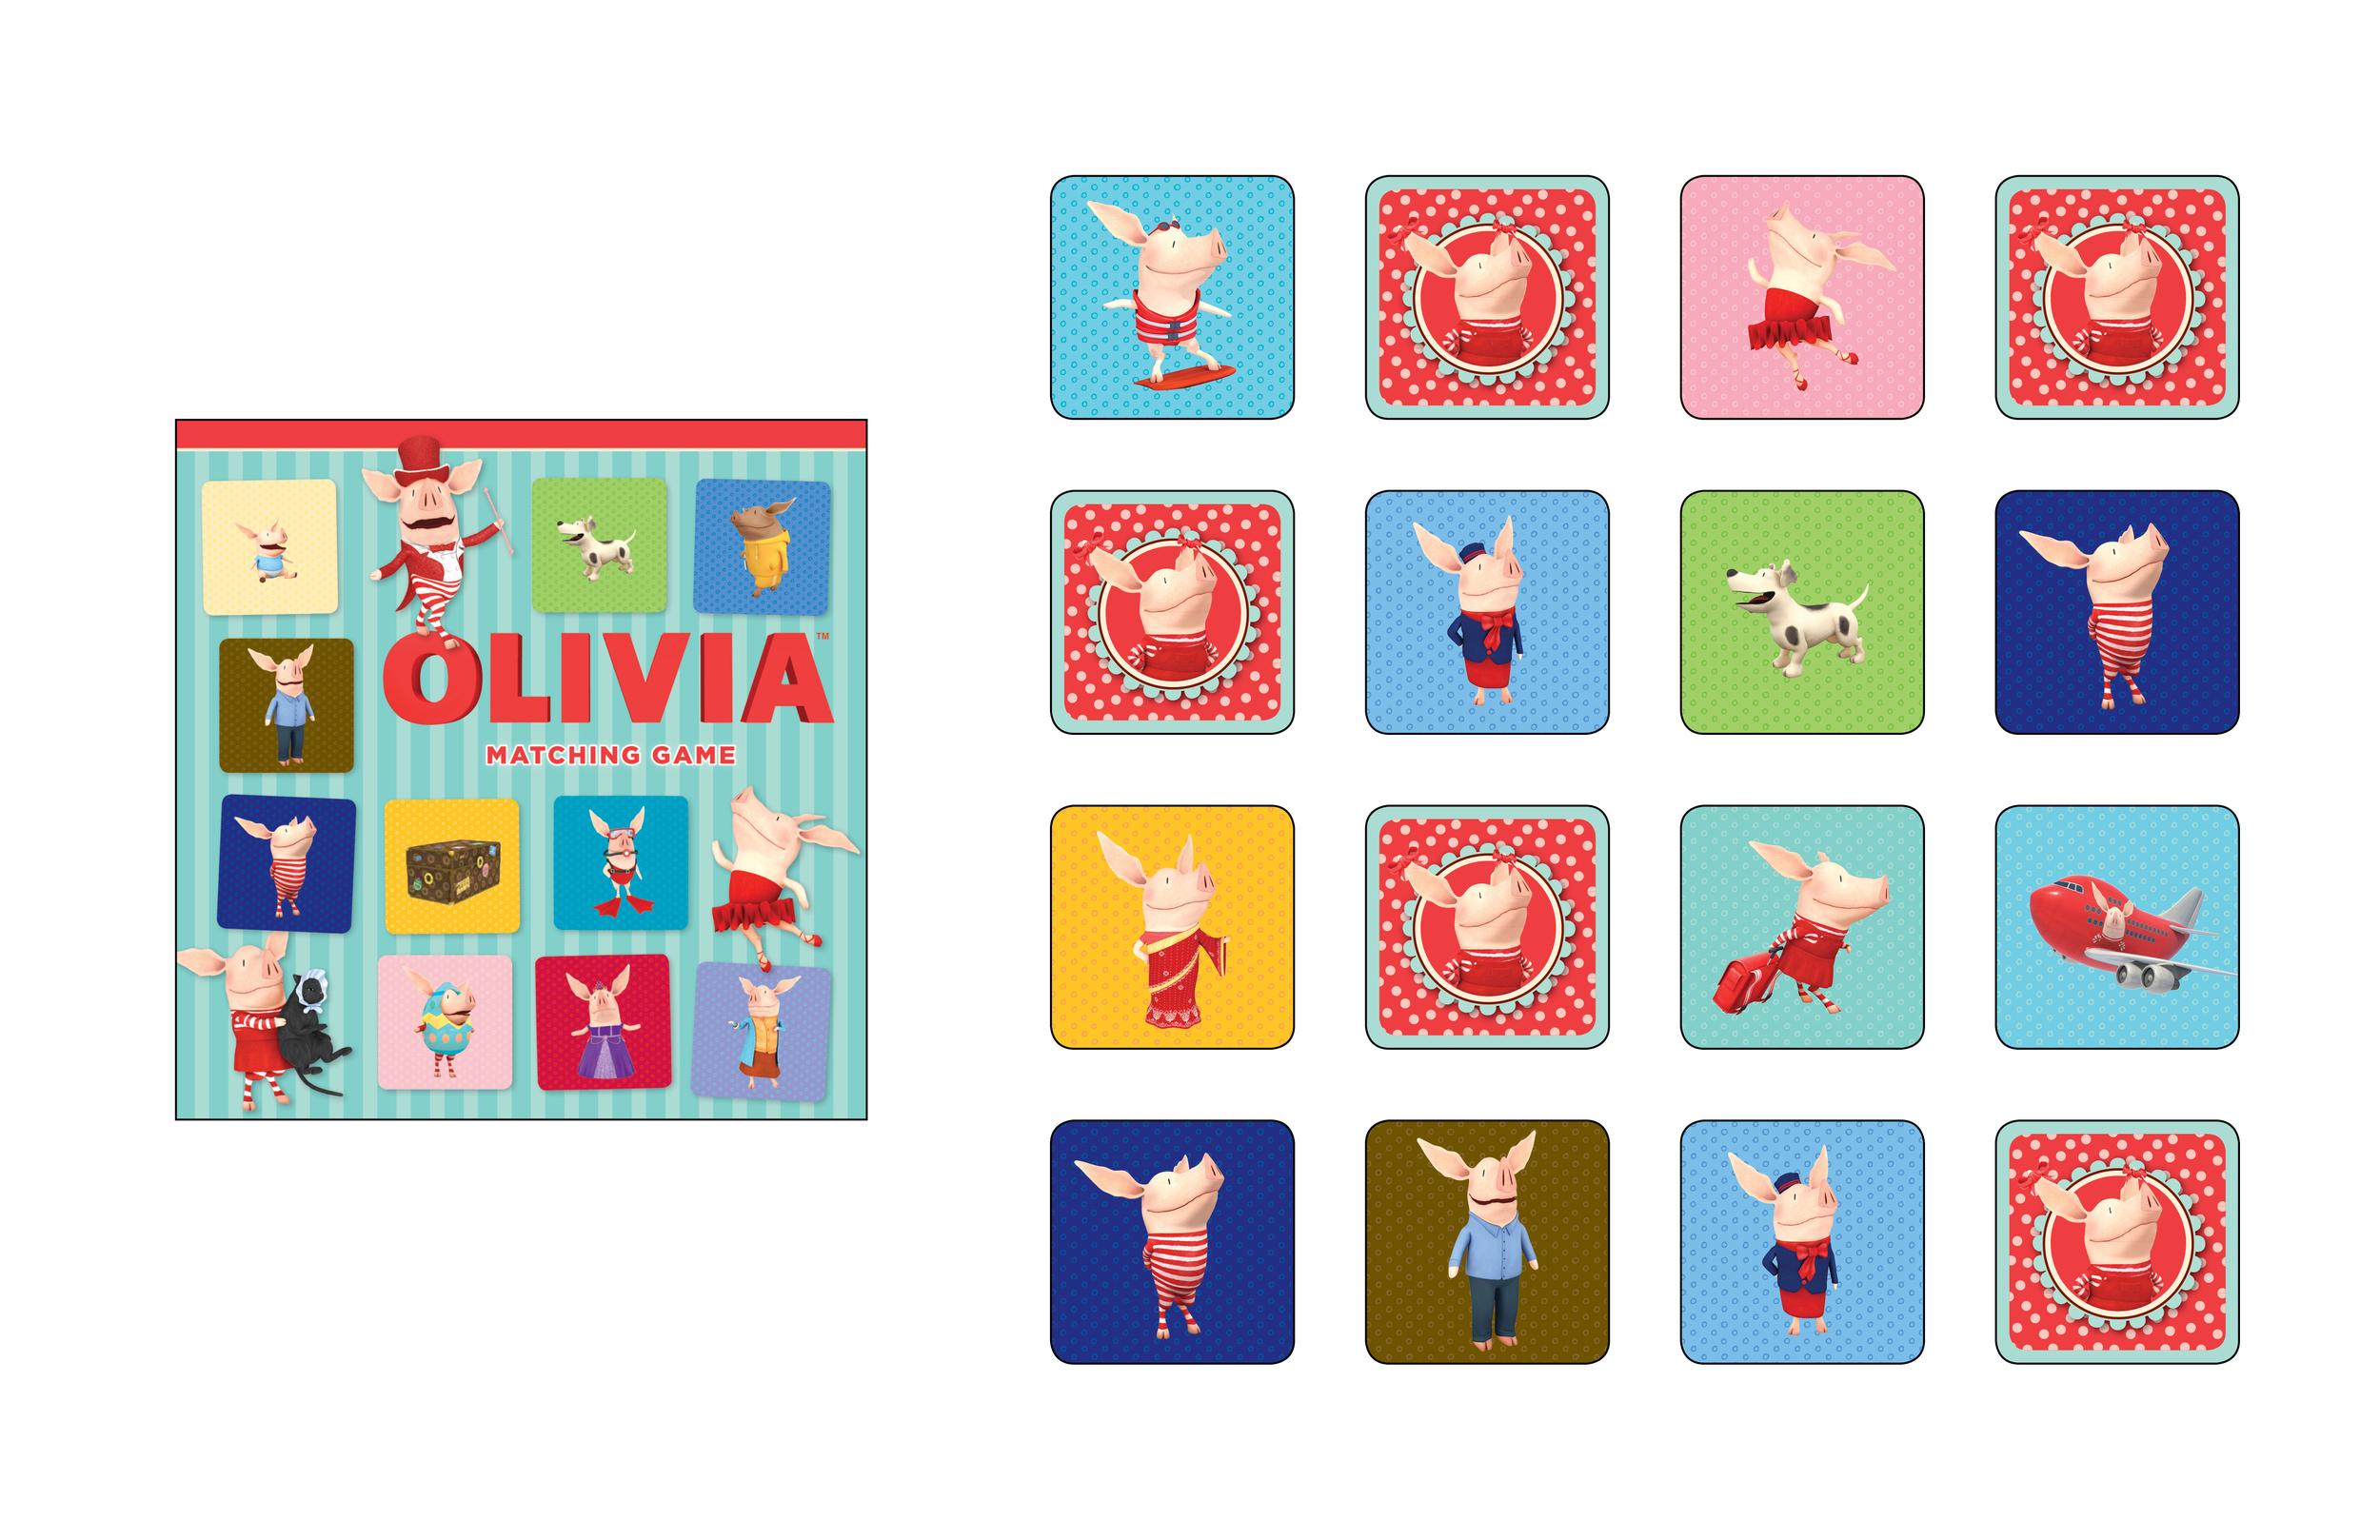 olivia_match-layout.jpg